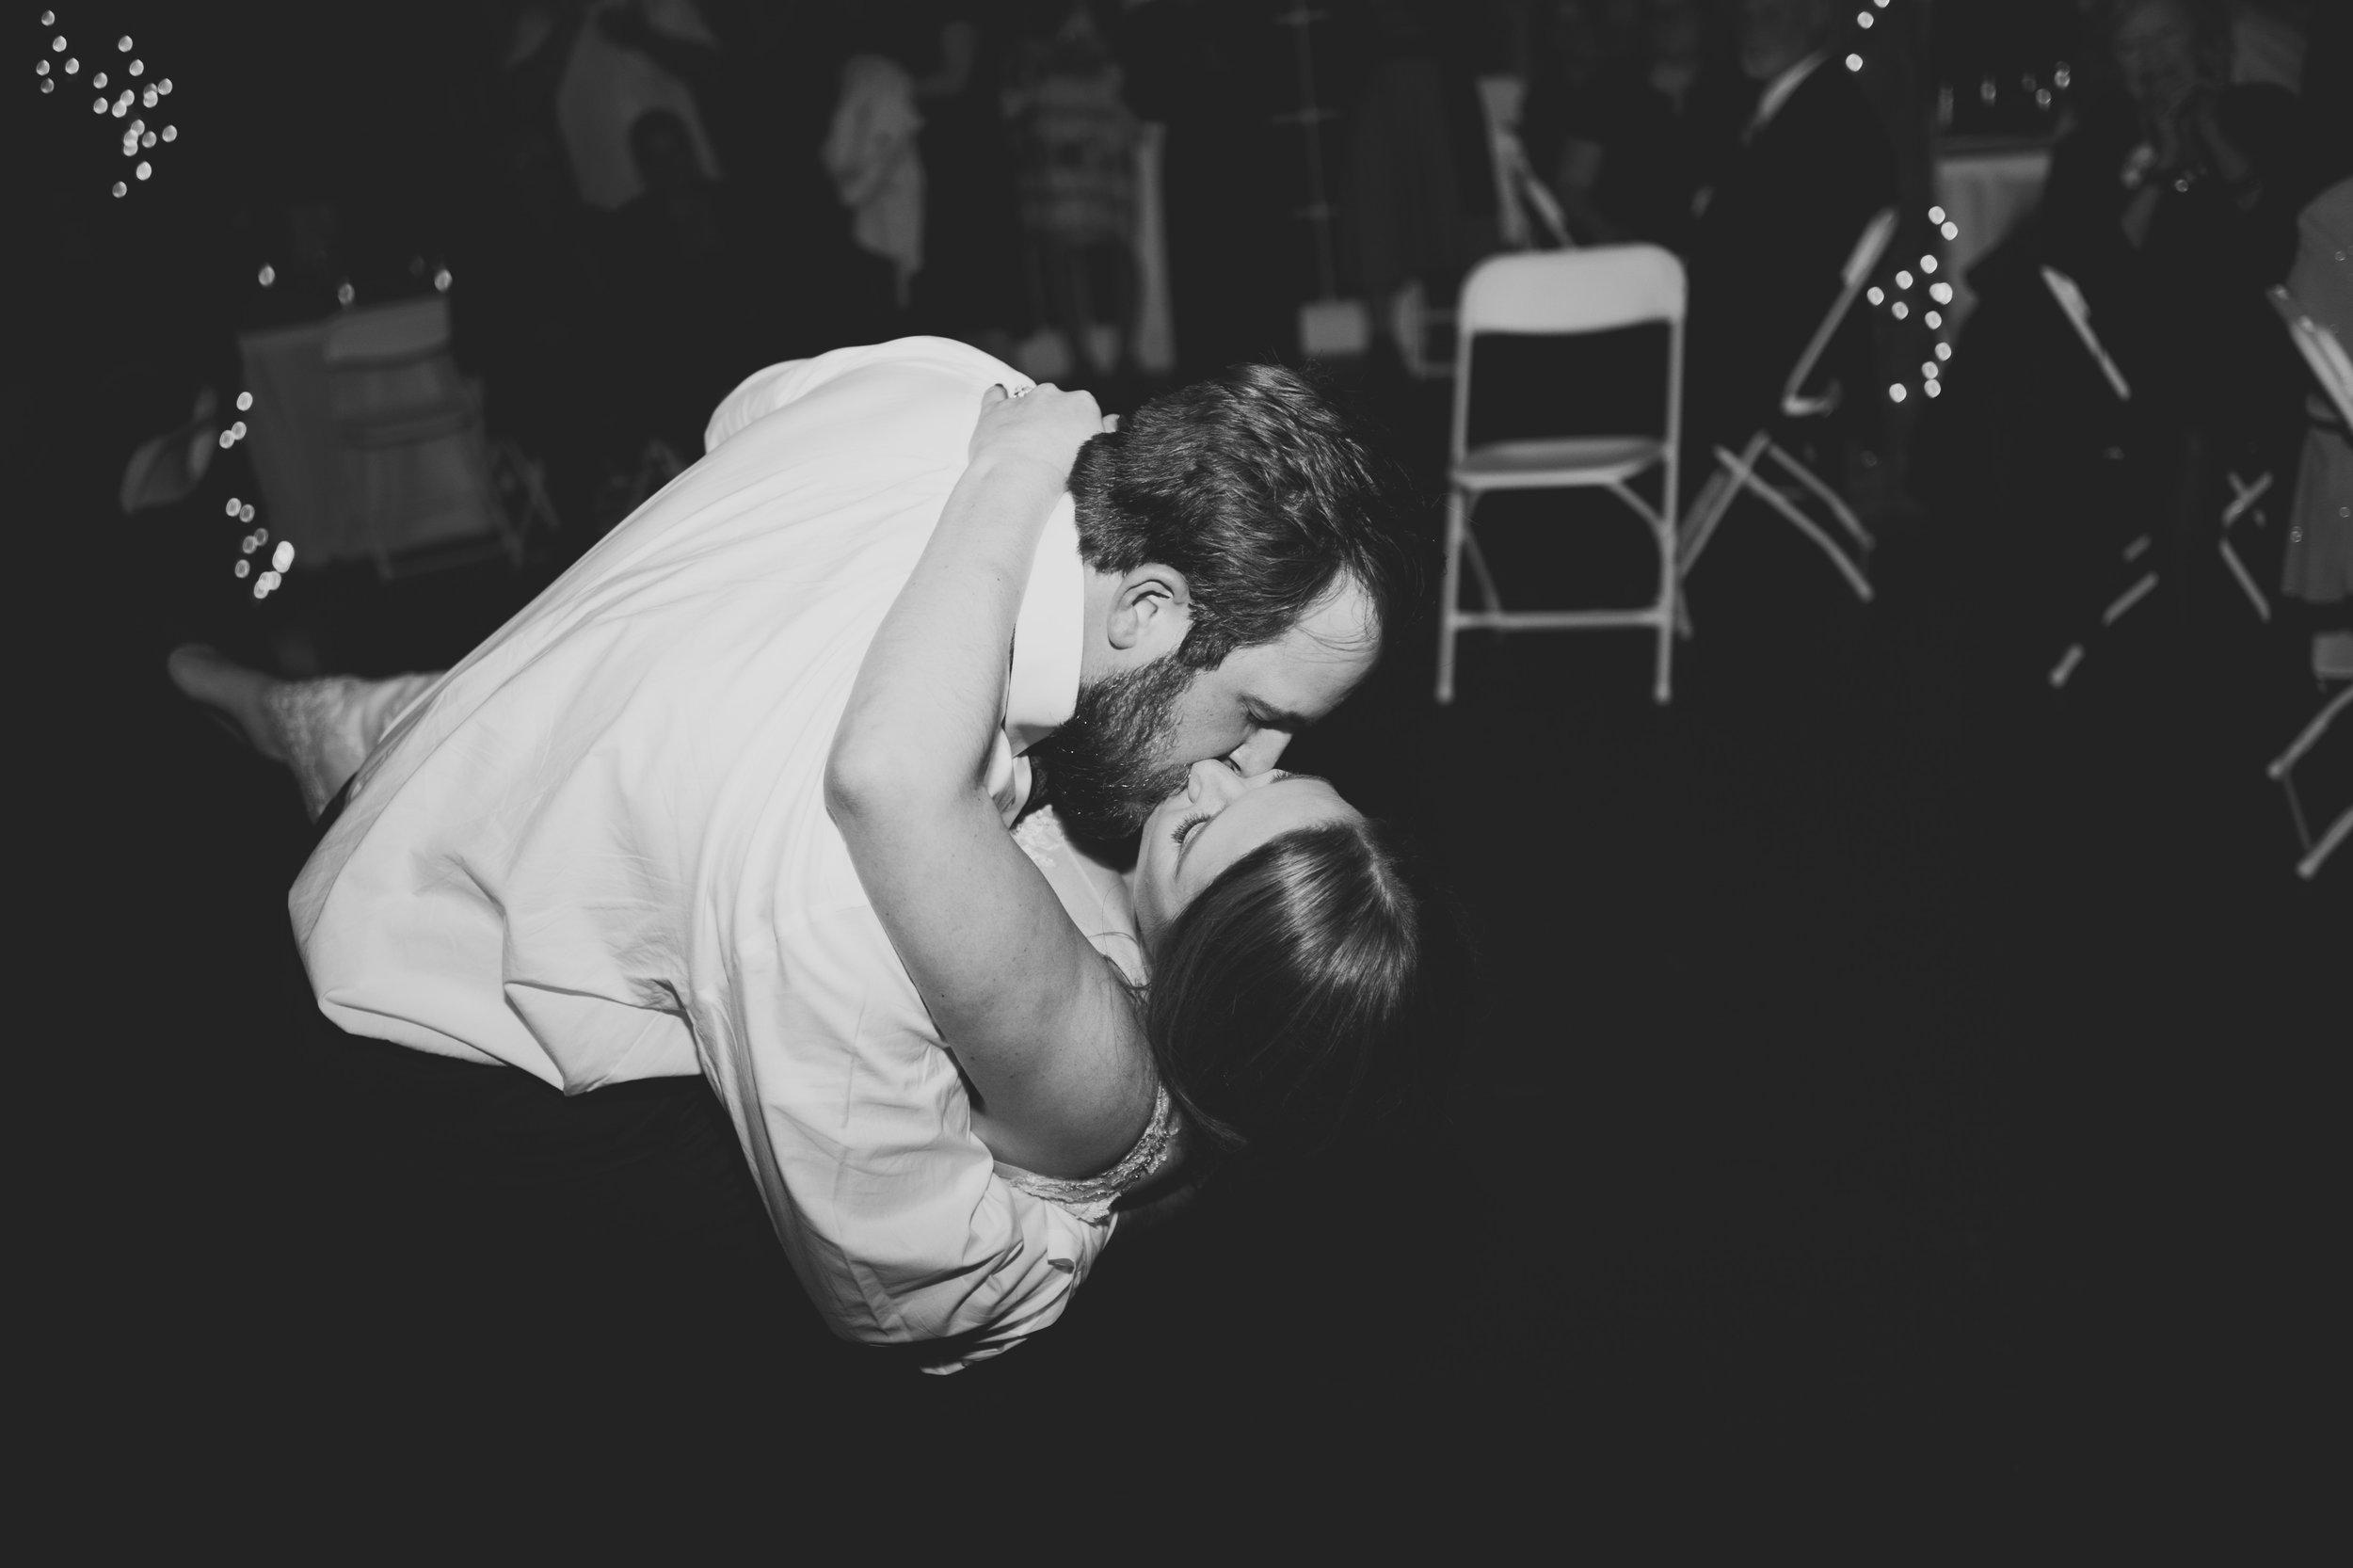 wildwoodfamilyfarms-wildwood farms-grand rapids-grand rapids wedding -grand rapids wedding photographer-wedding-wildwood farms wedding-michigan wedding-west michigan photographer-jessica darling-j darling photo-becca and josh wedding 113.jpg